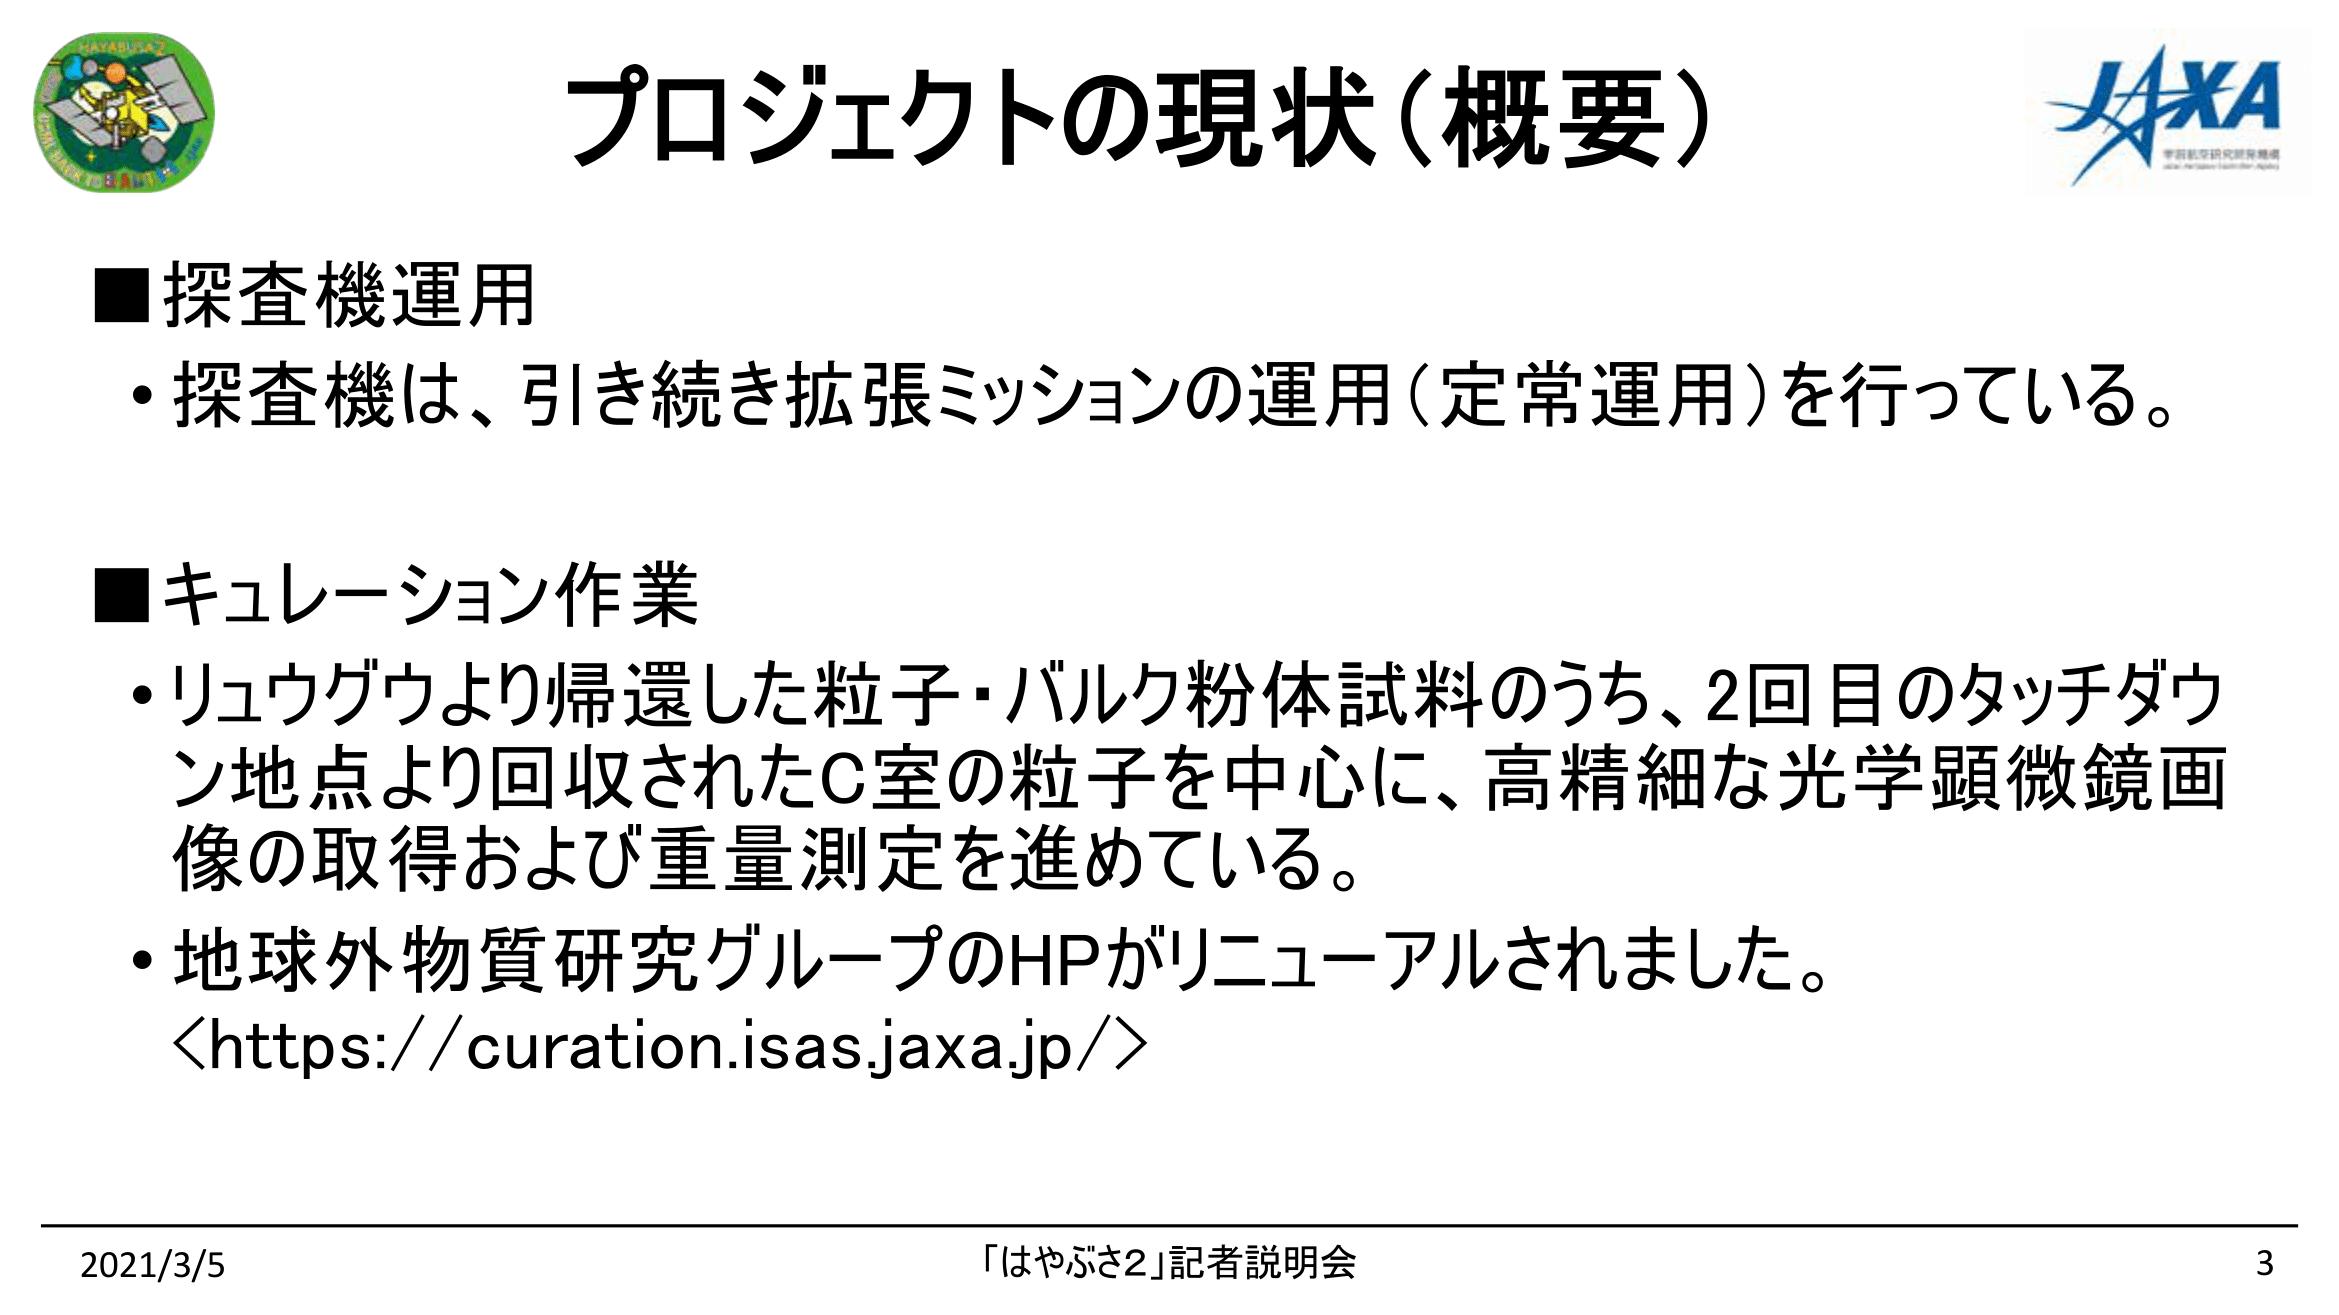 f:id:Imamura:20210305134009p:plain